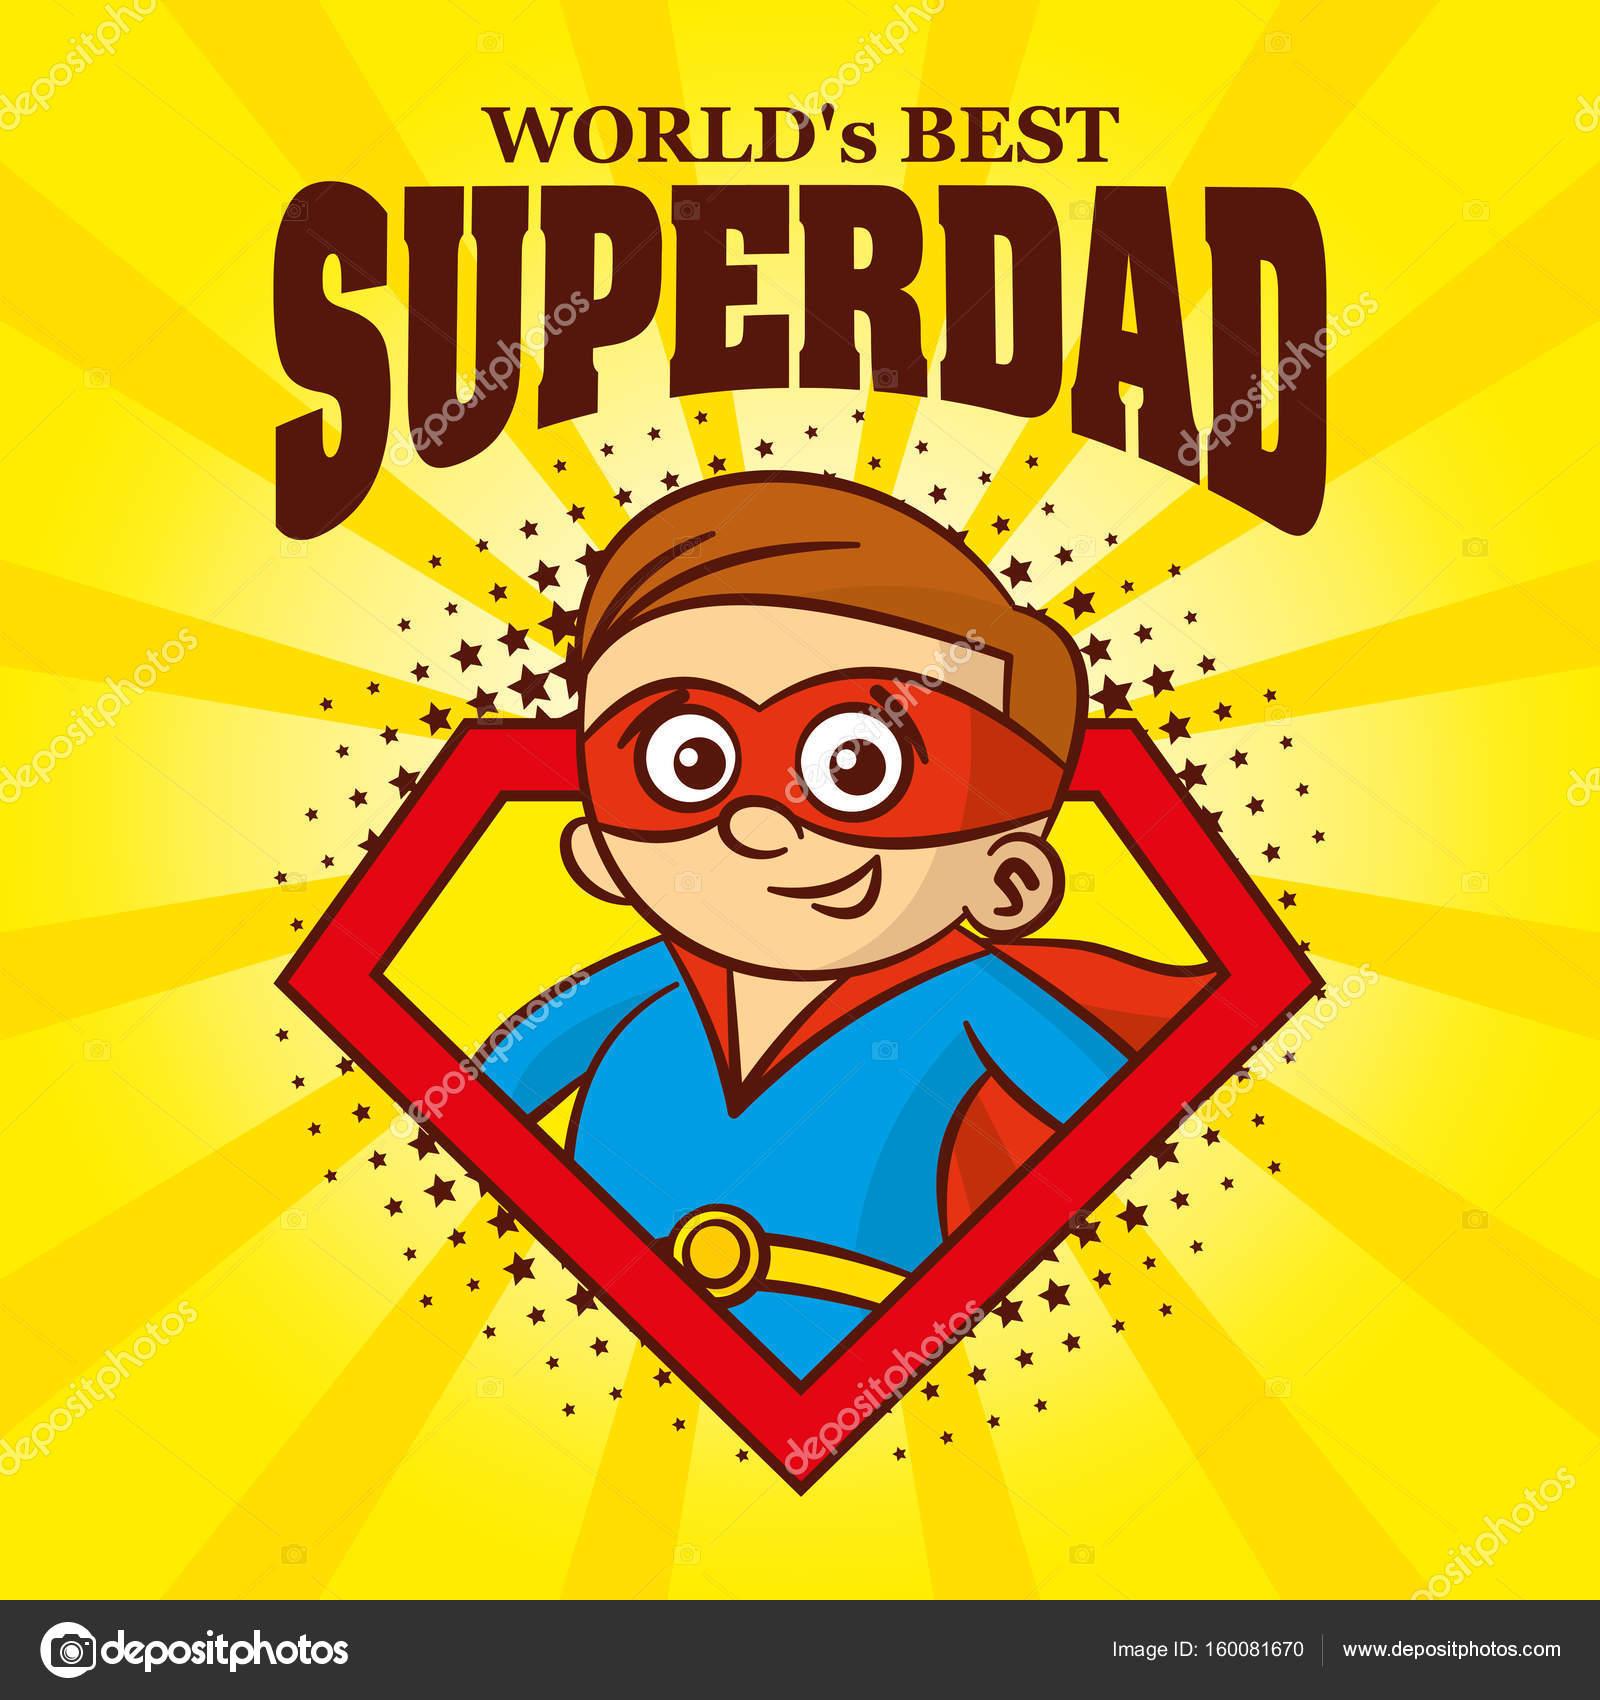 superh233roe de superdad logo de dibujos animados car225cter